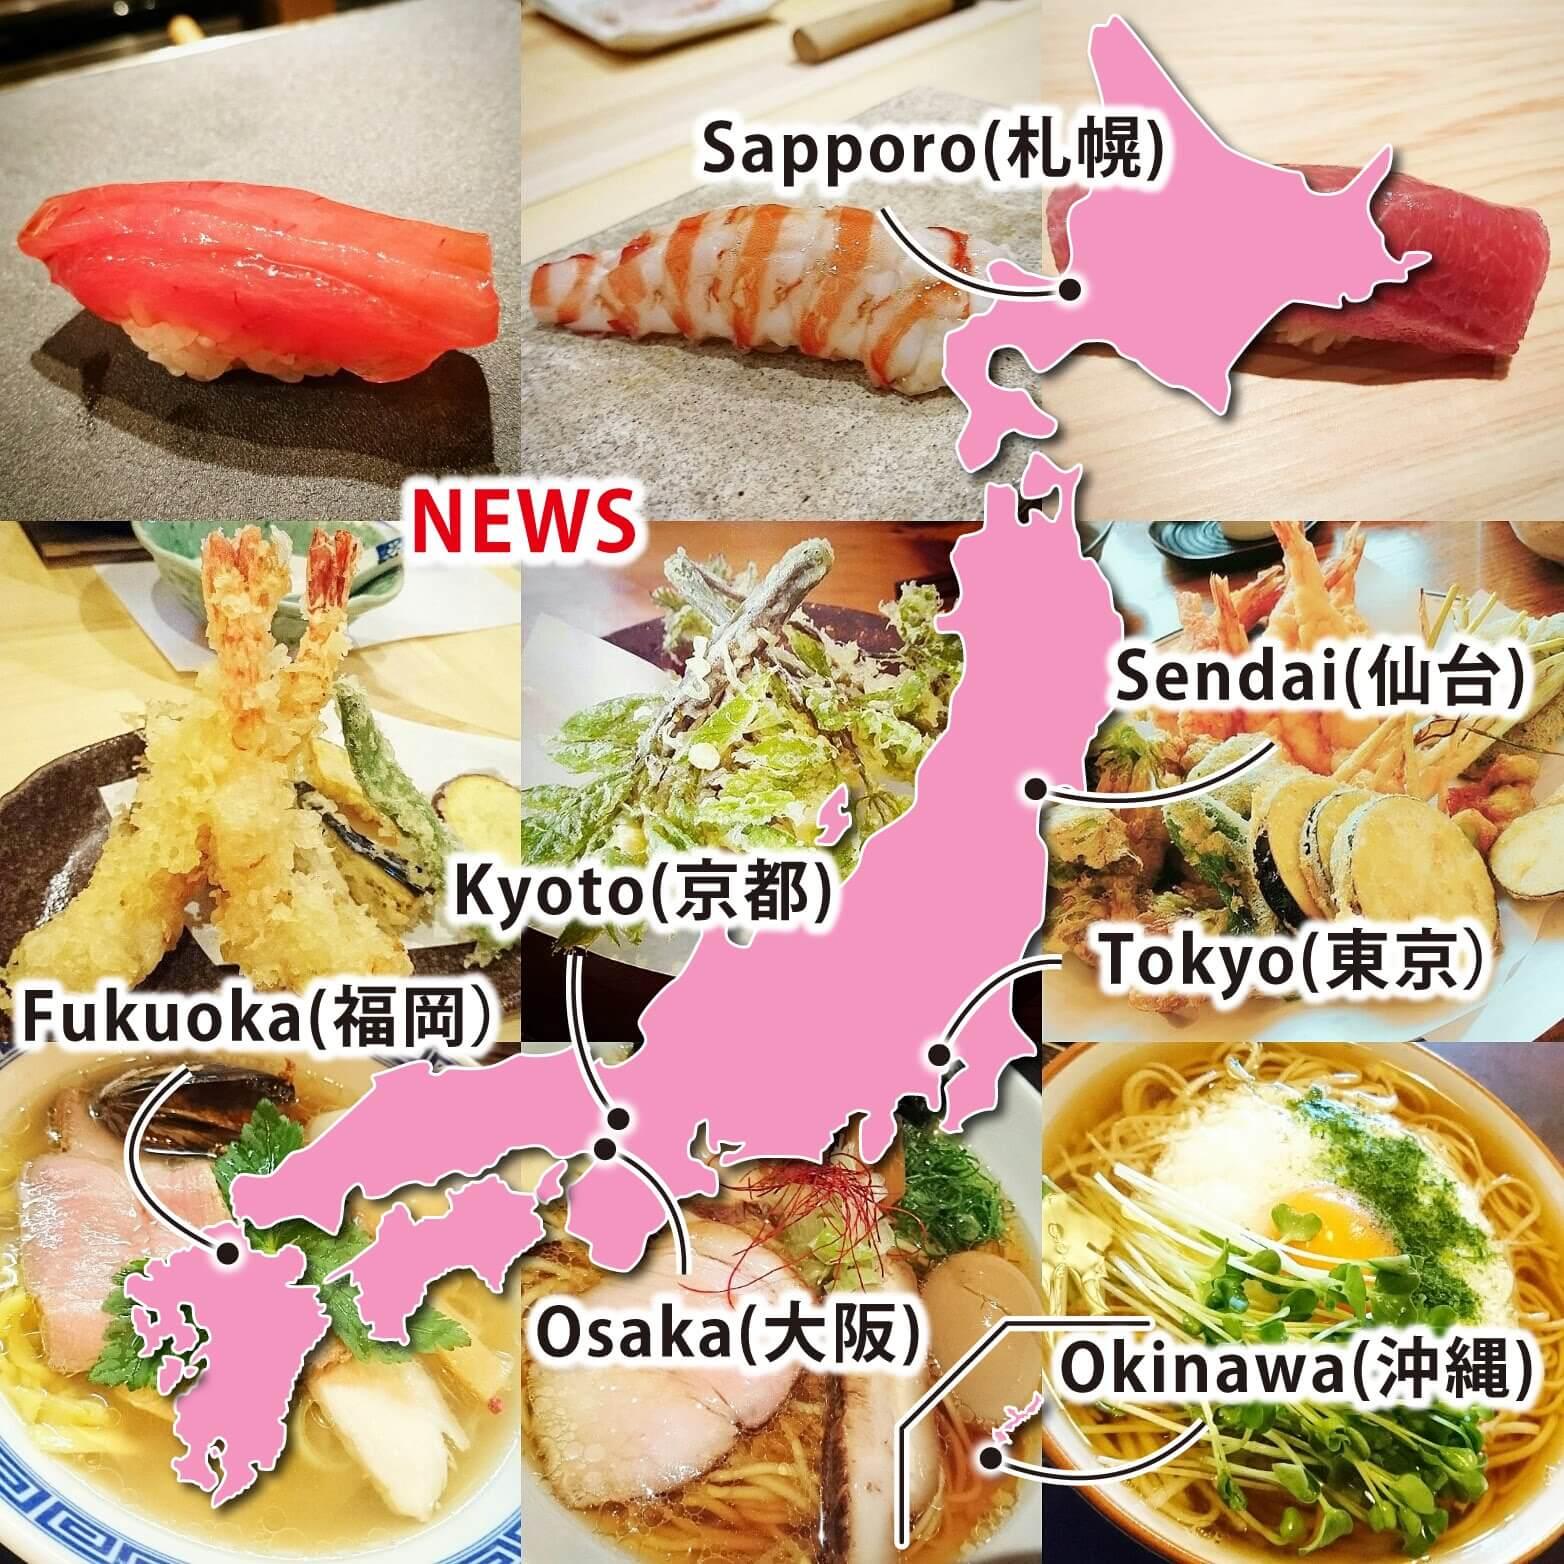 Japanese Foodie 🌸 Shiori